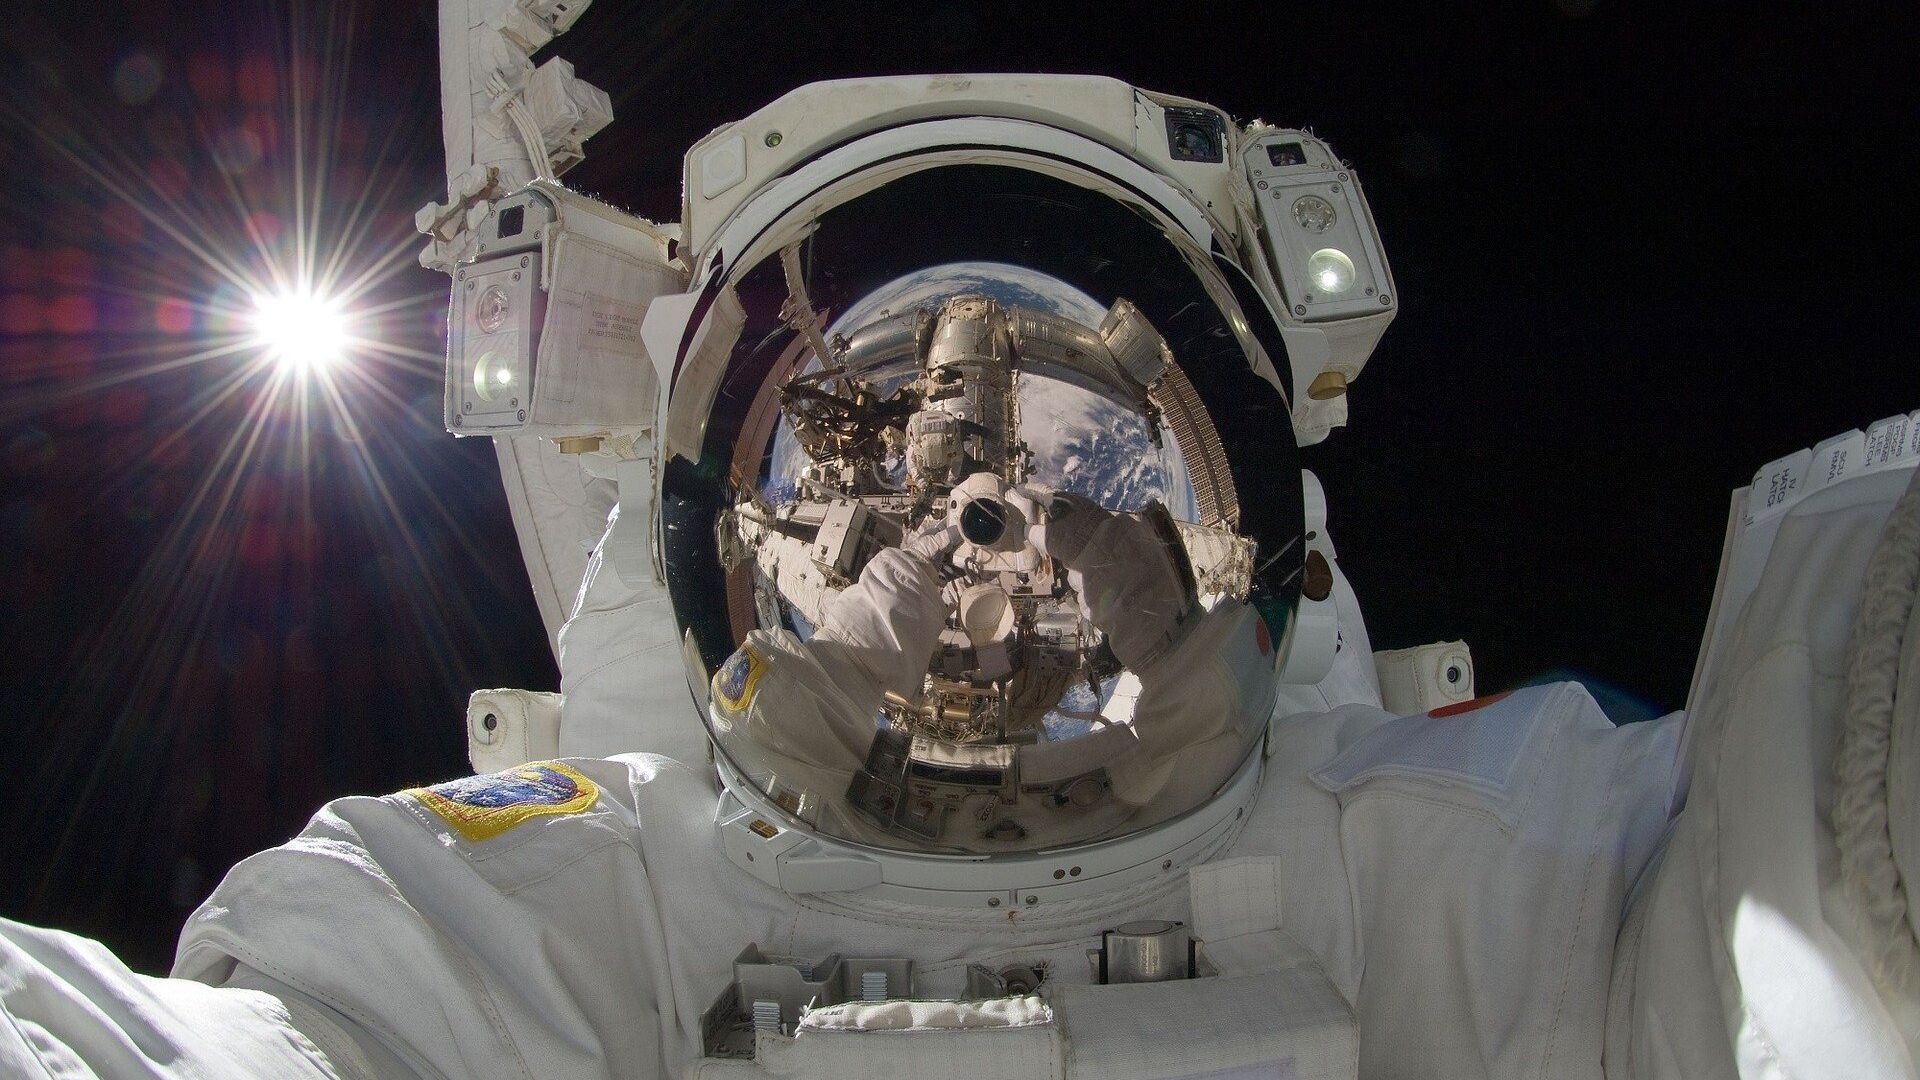 Un astronauta (imagen referencial) - Sputnik Mundo, 1920, 20.06.2021